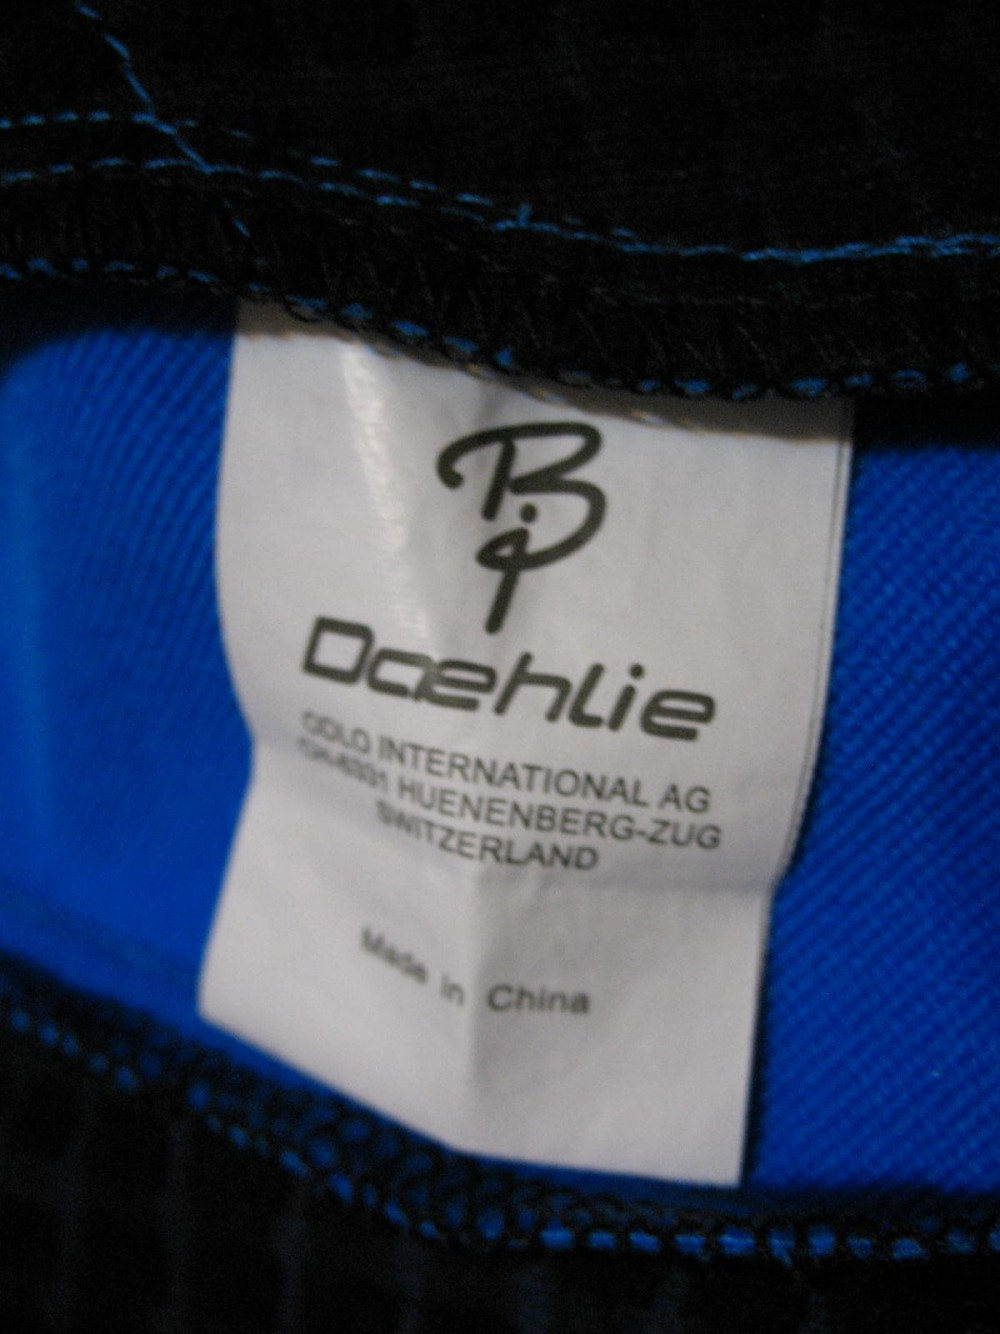 Куртка BJORN DAEHLIE by ODLO toko windproof jacket (размер L/XL) - 8